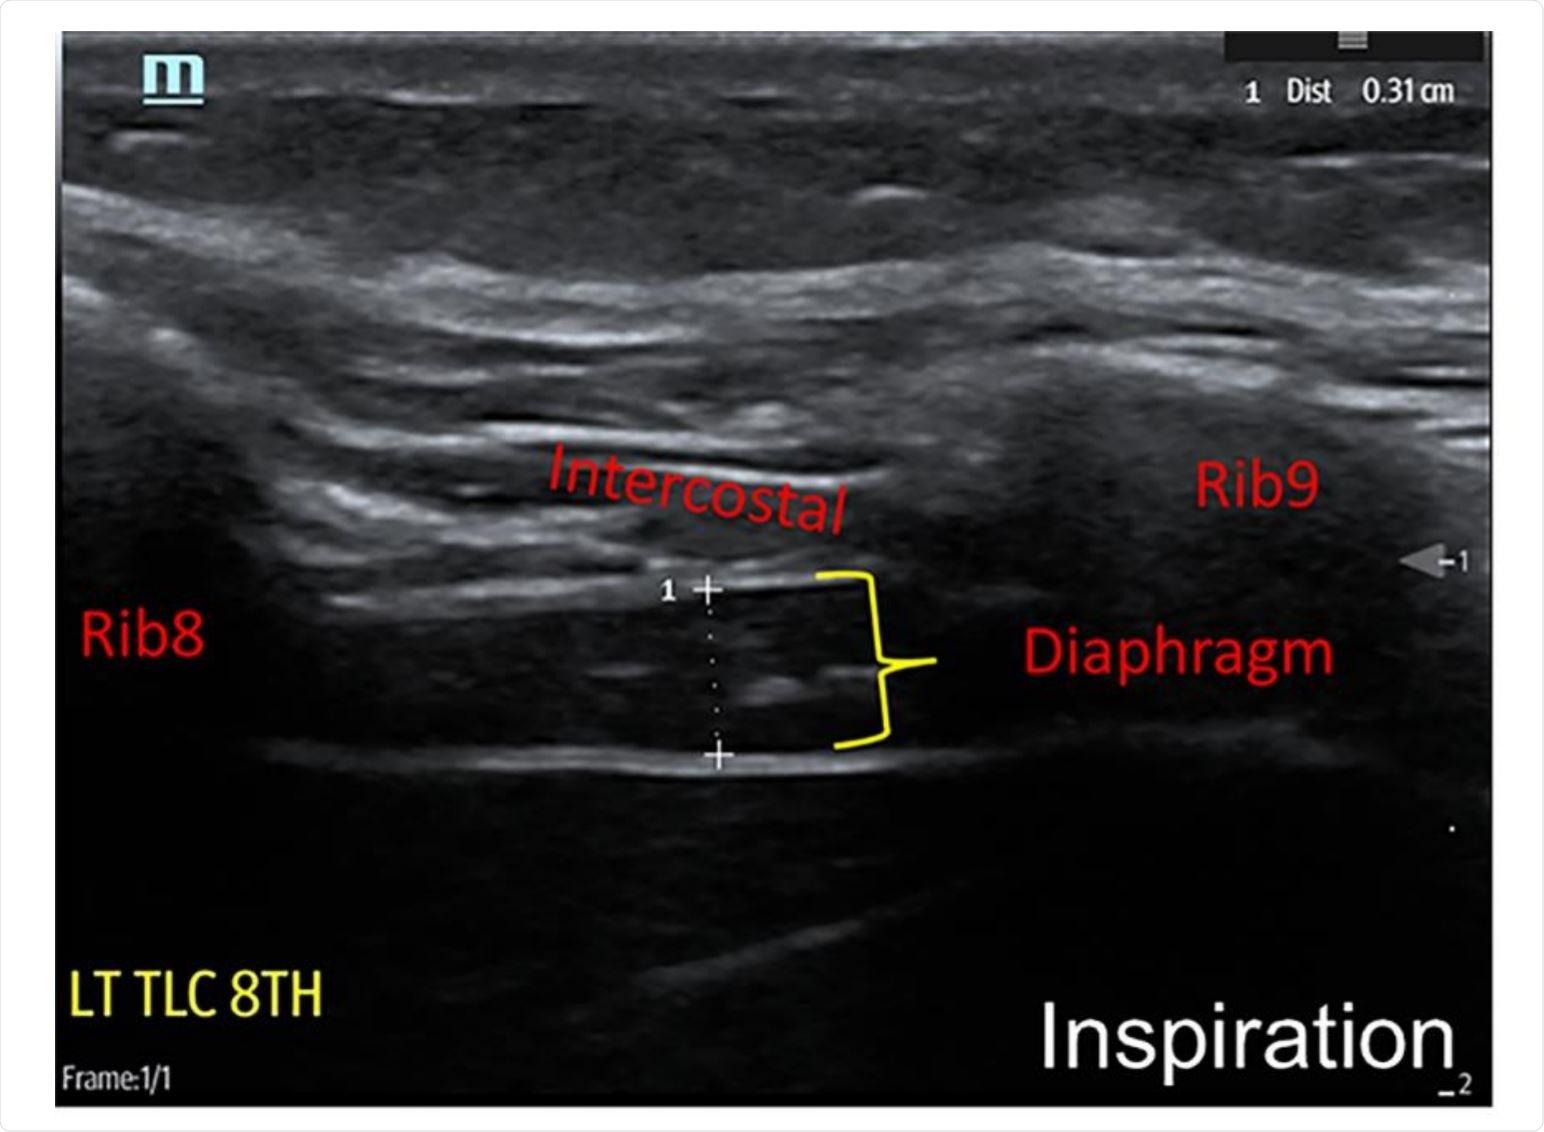 Technique for neuromuscular ultrasound examination of hemi-diaphragm